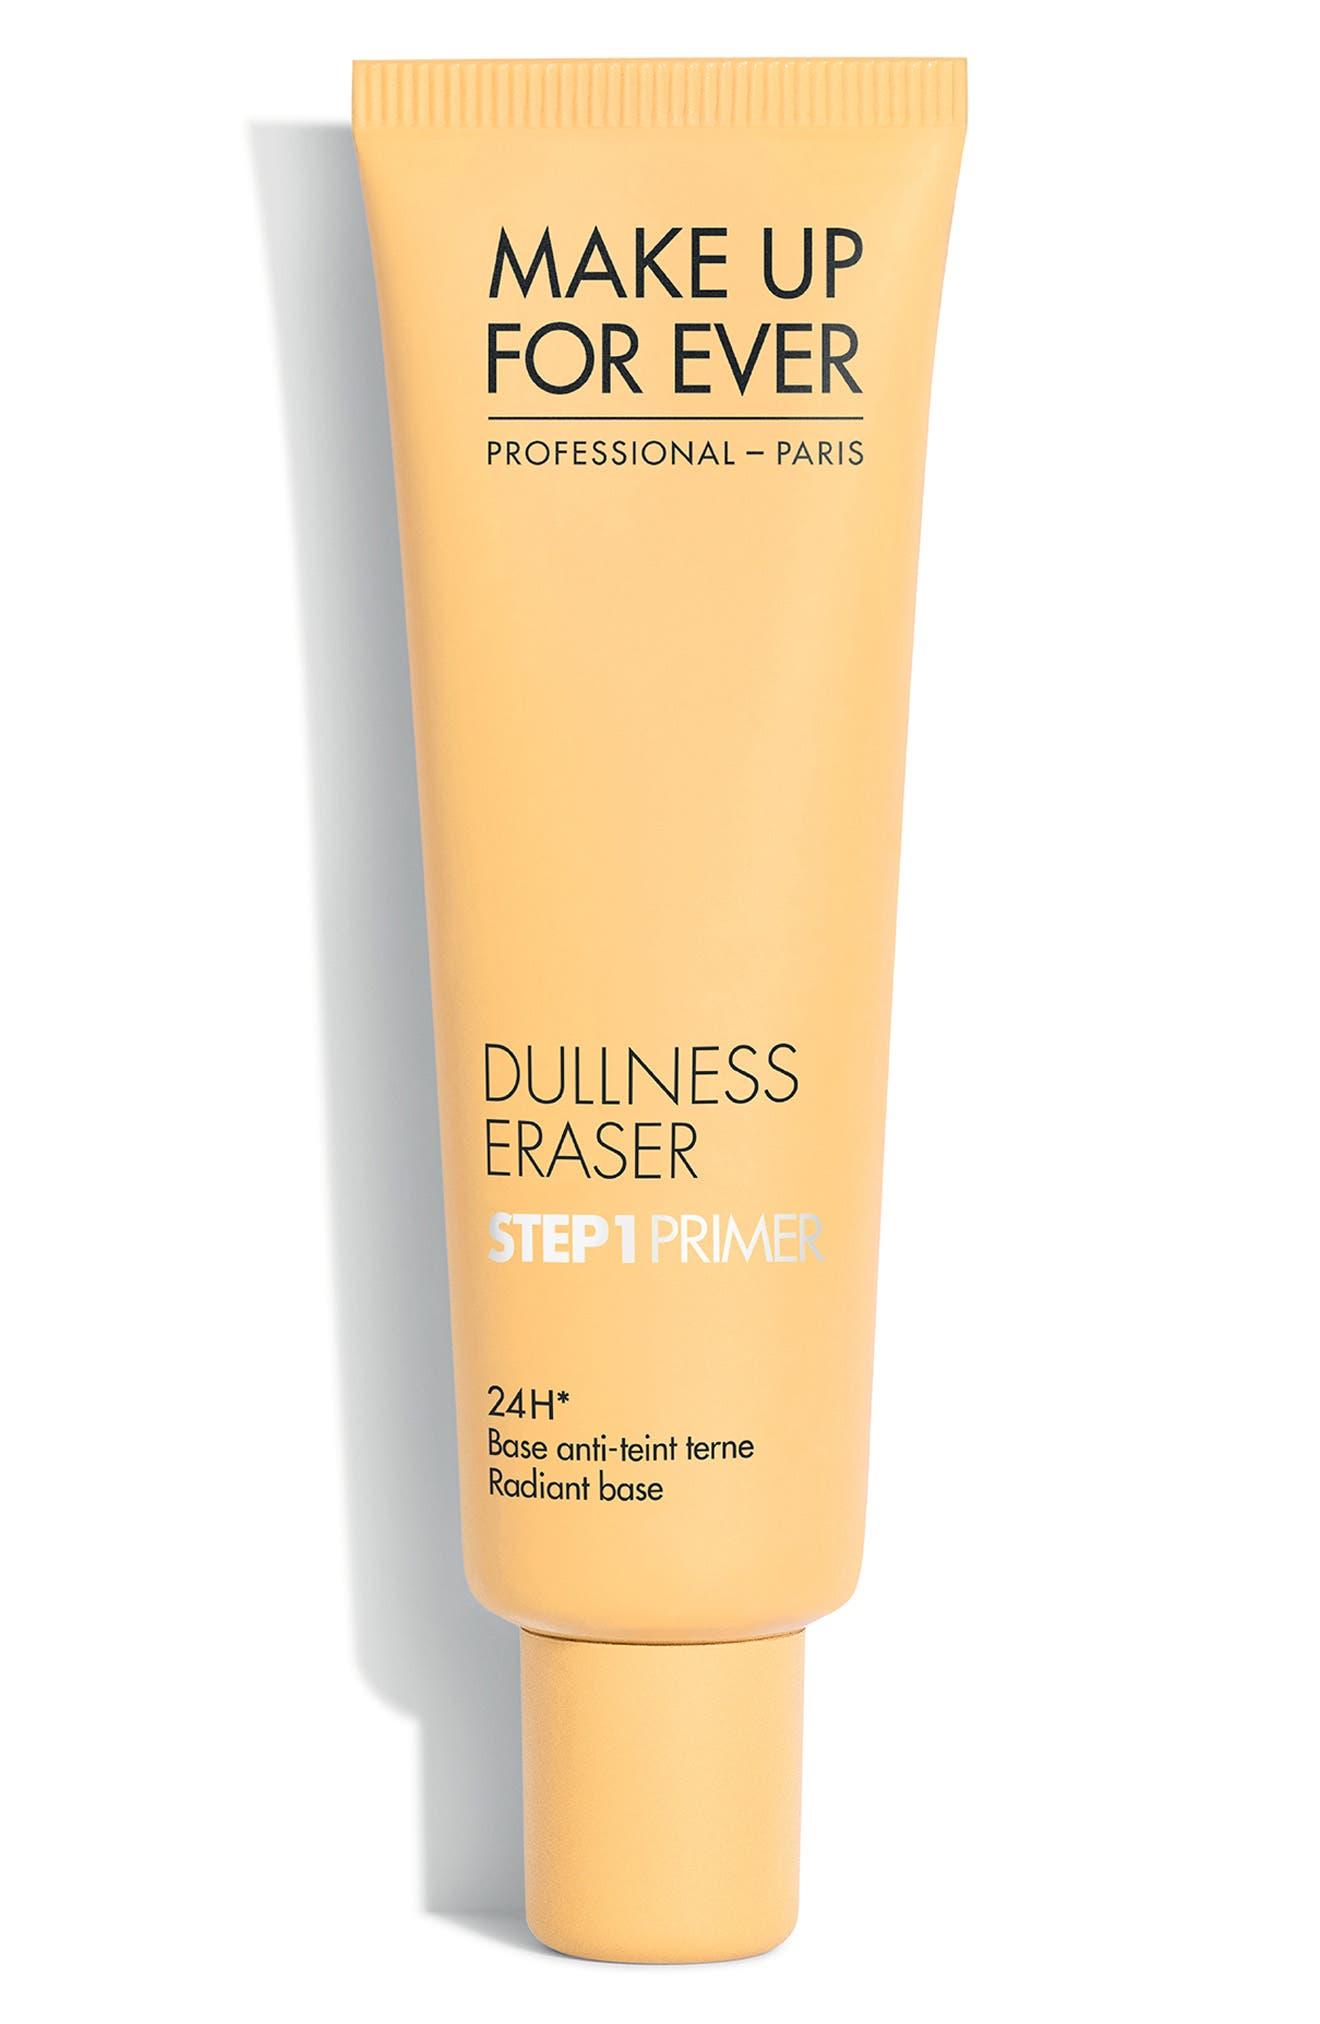 Step 1 Primer Dullness Eraser